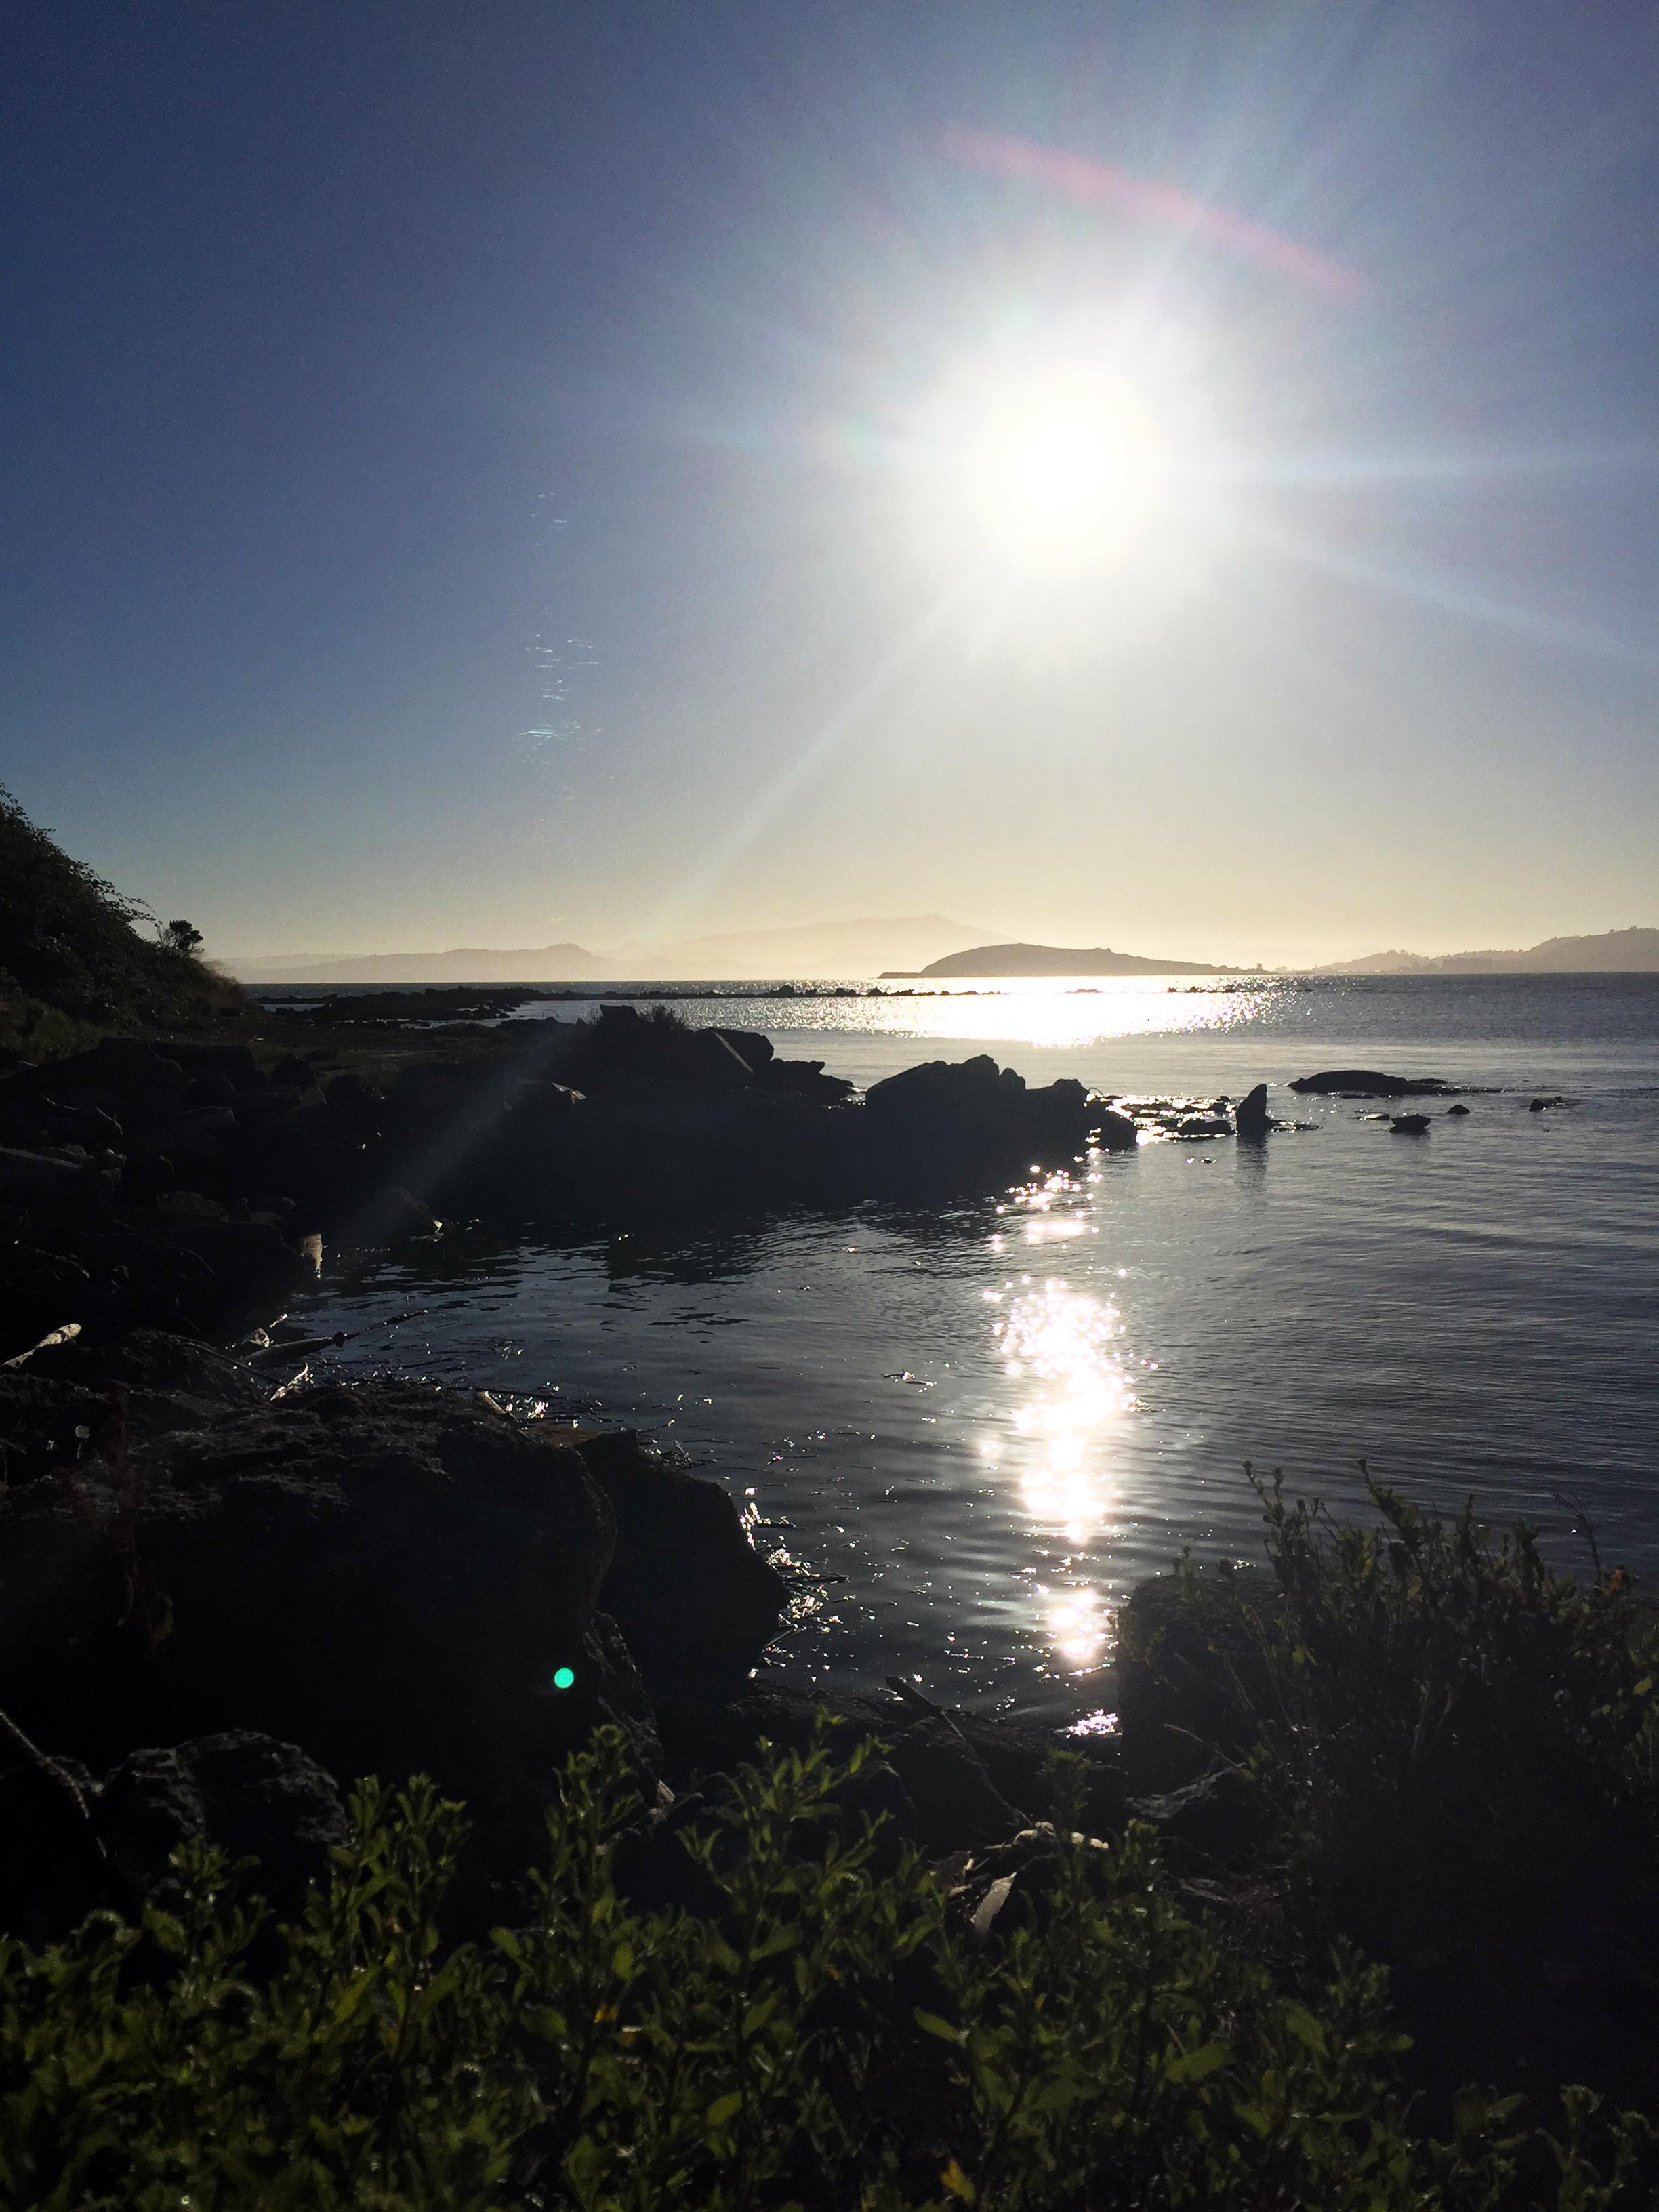 San Francisco Bay, taken at McLaughlin Eastshore State Park on7.20.17